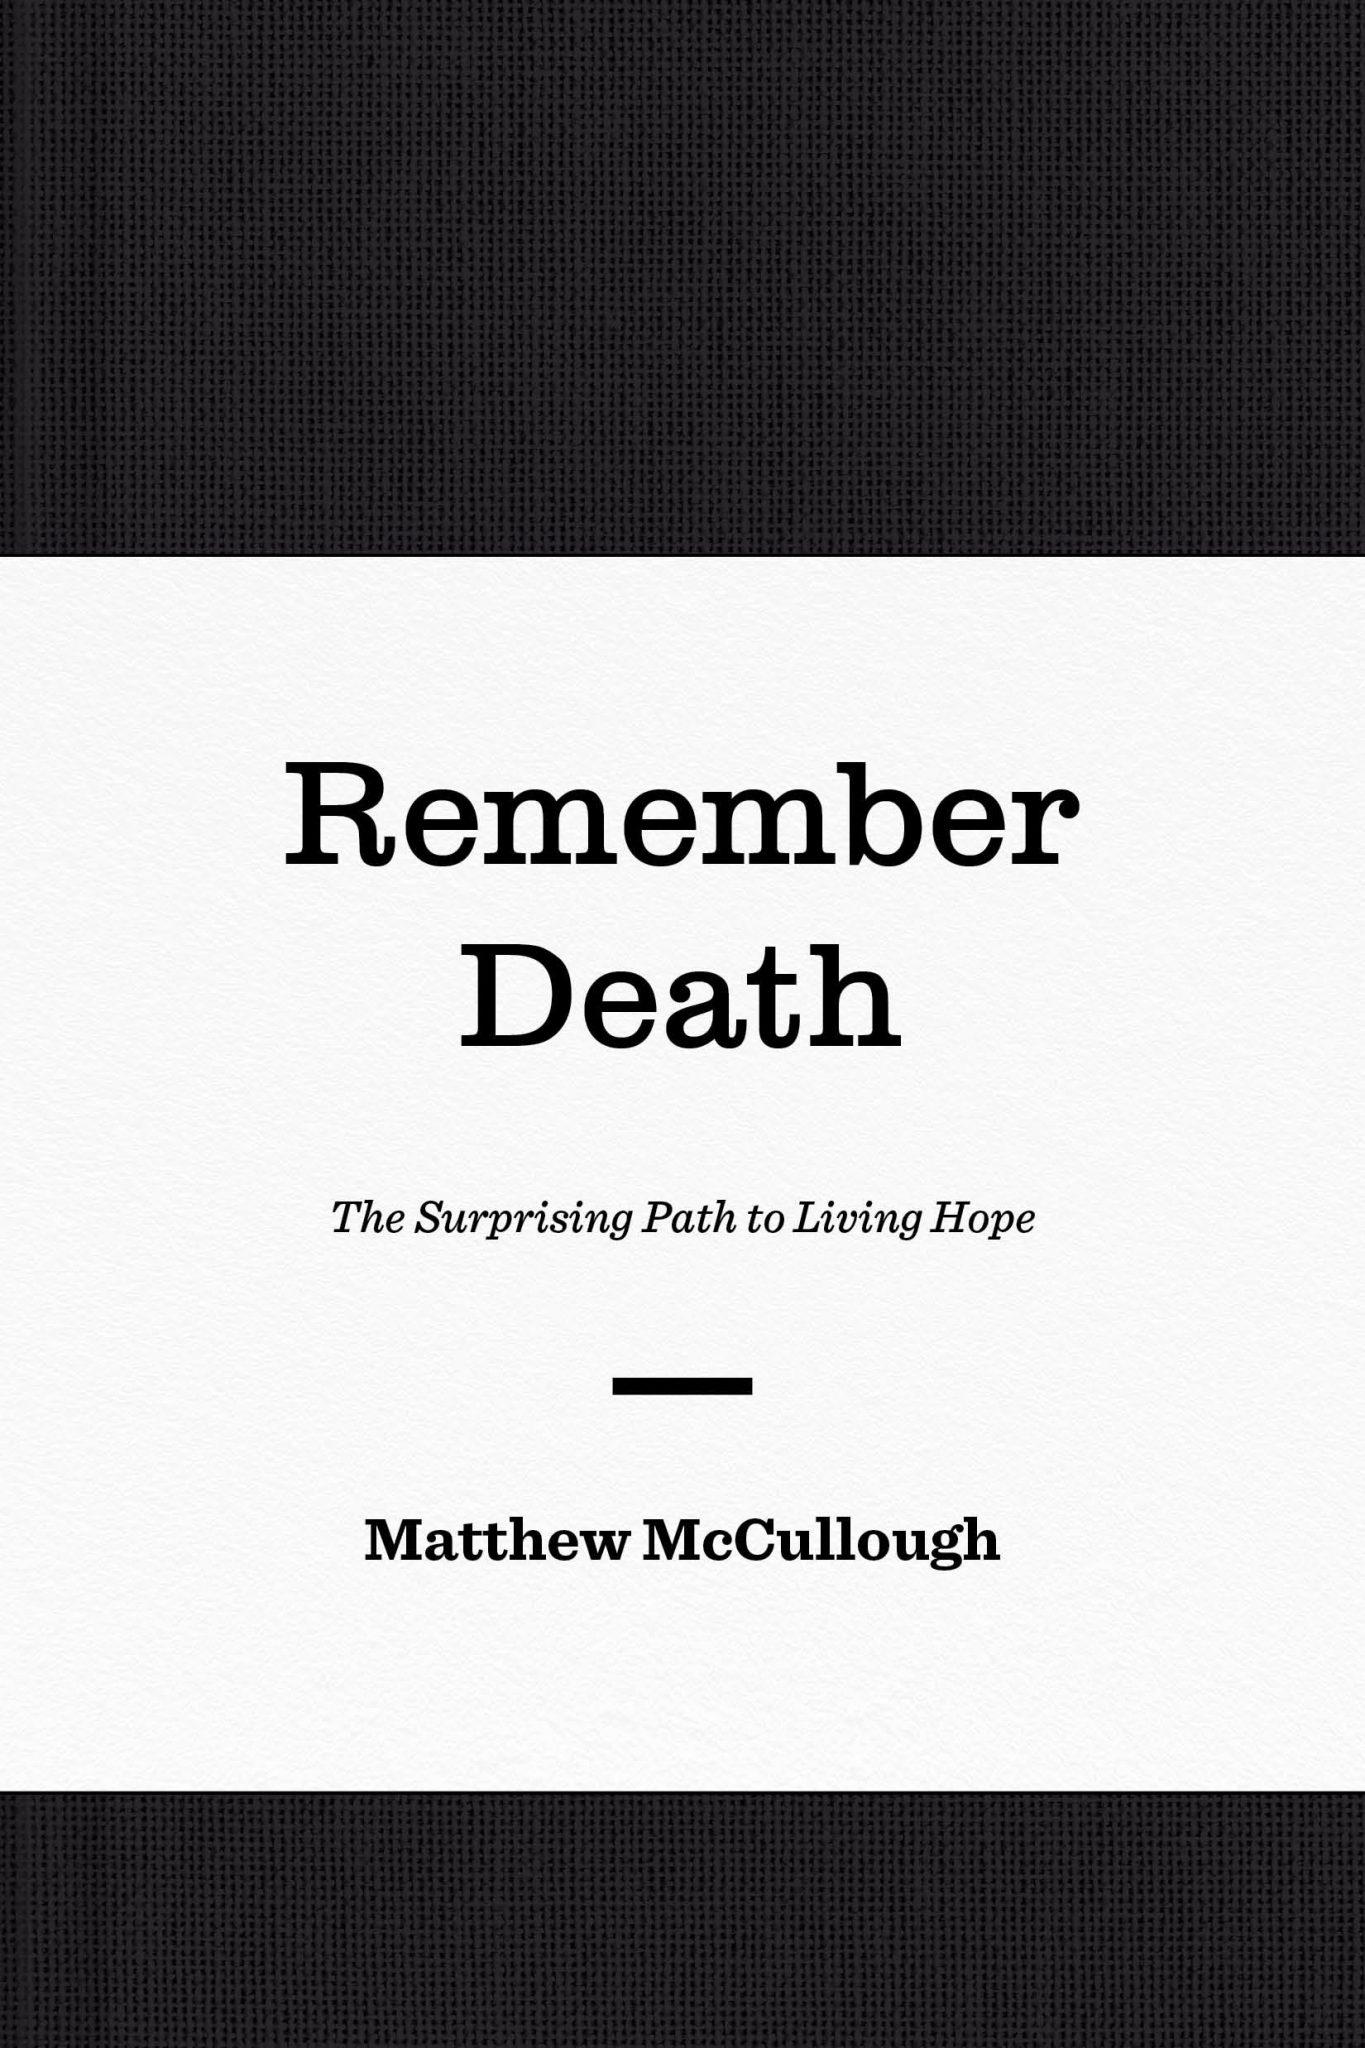 Remember Death  Enjoy a Life of Hope